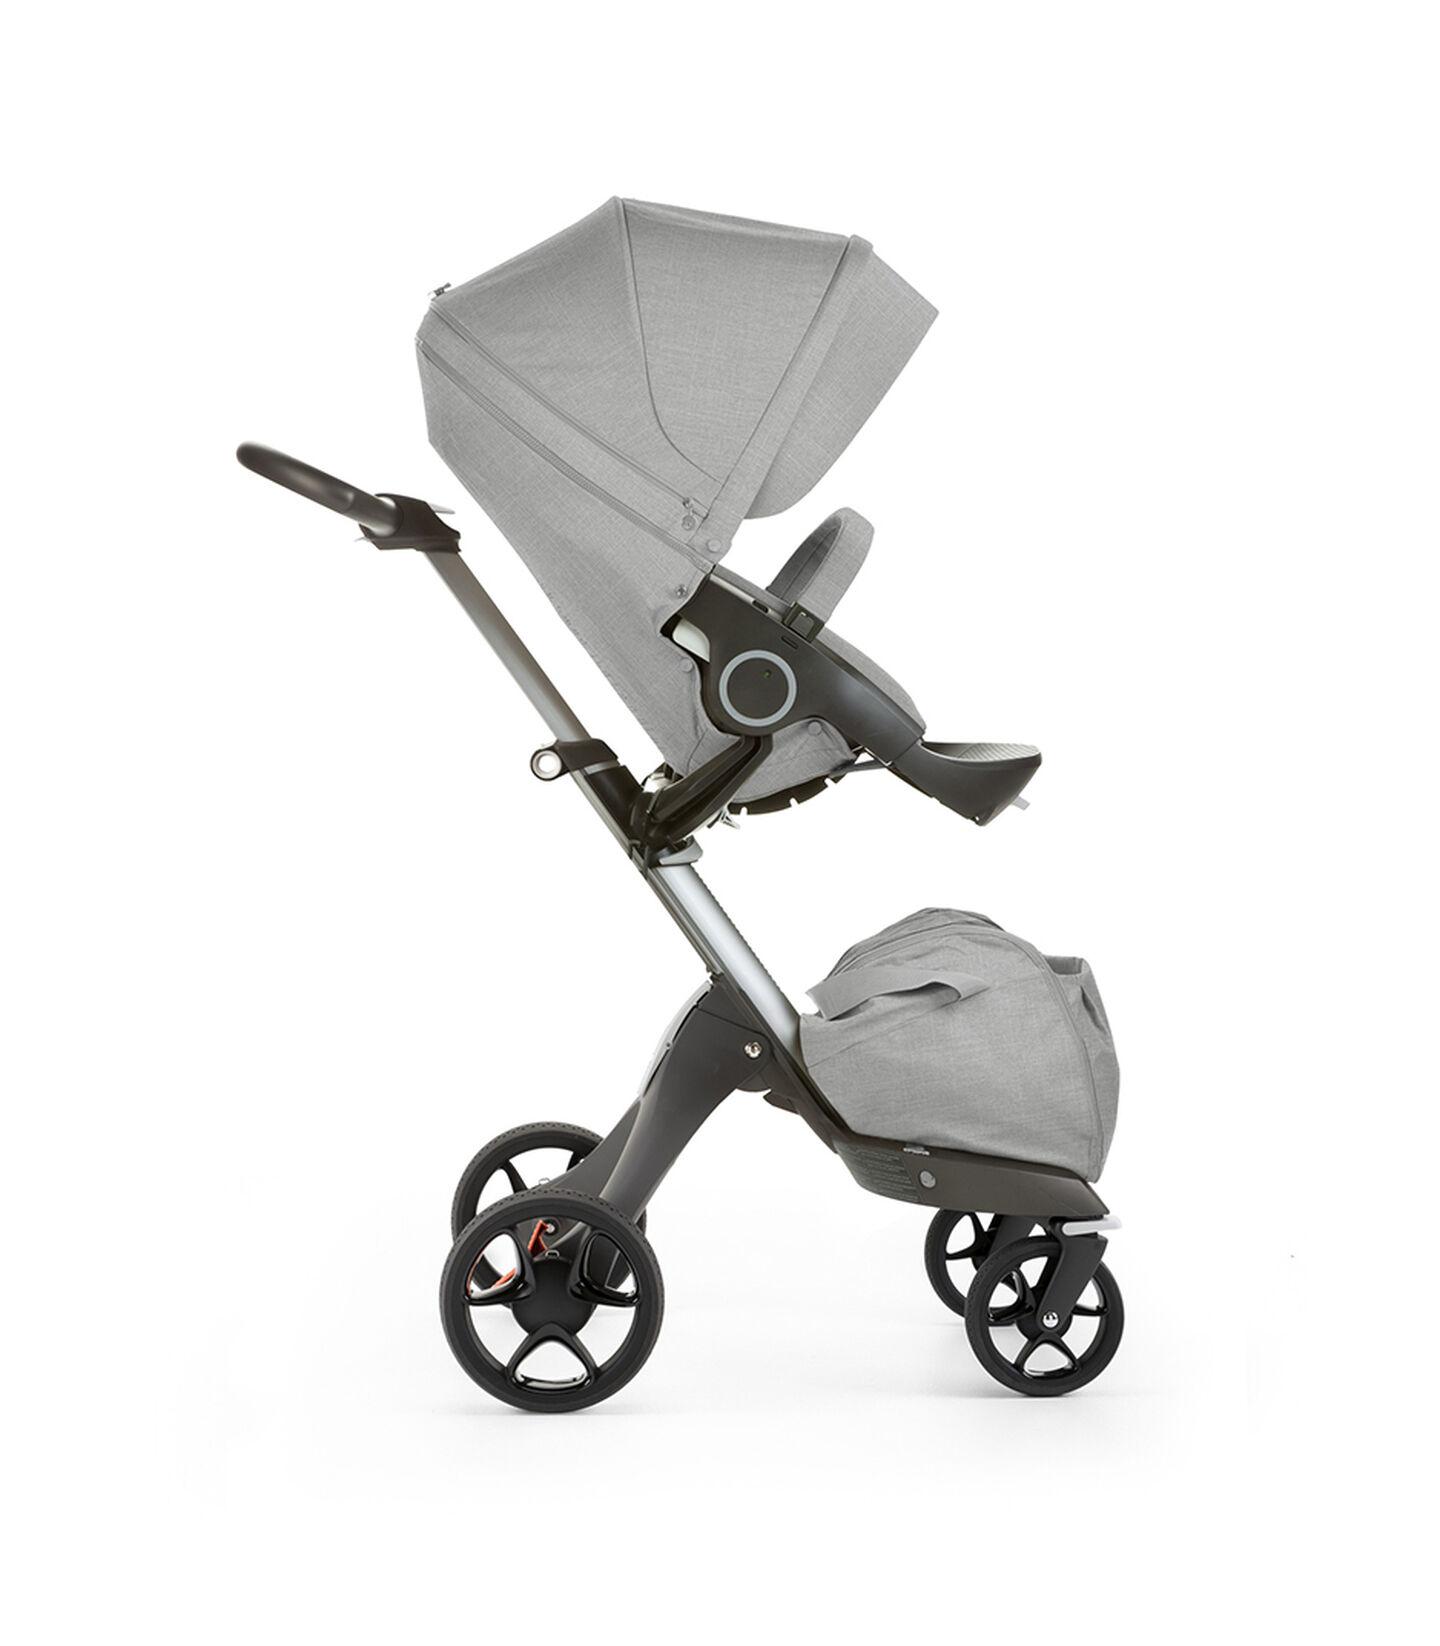 Stokke® Xplory® with Stokke® Stroller Seat, forward facing, rest position. Grey Melange. New wheels 2016.